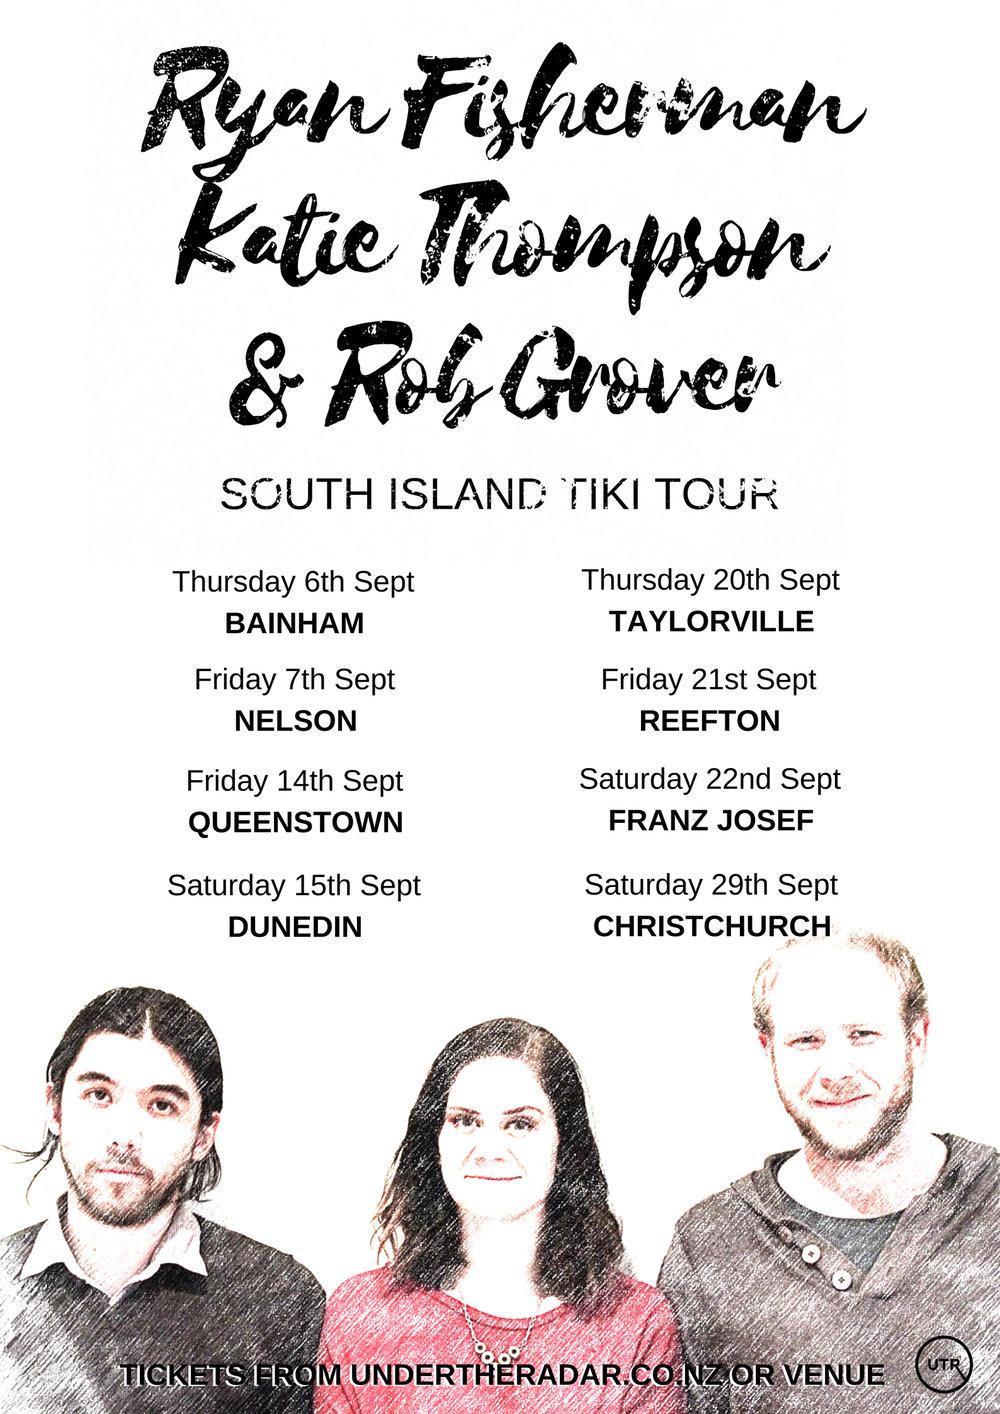 South Island Tiki Tour 2018.jpg